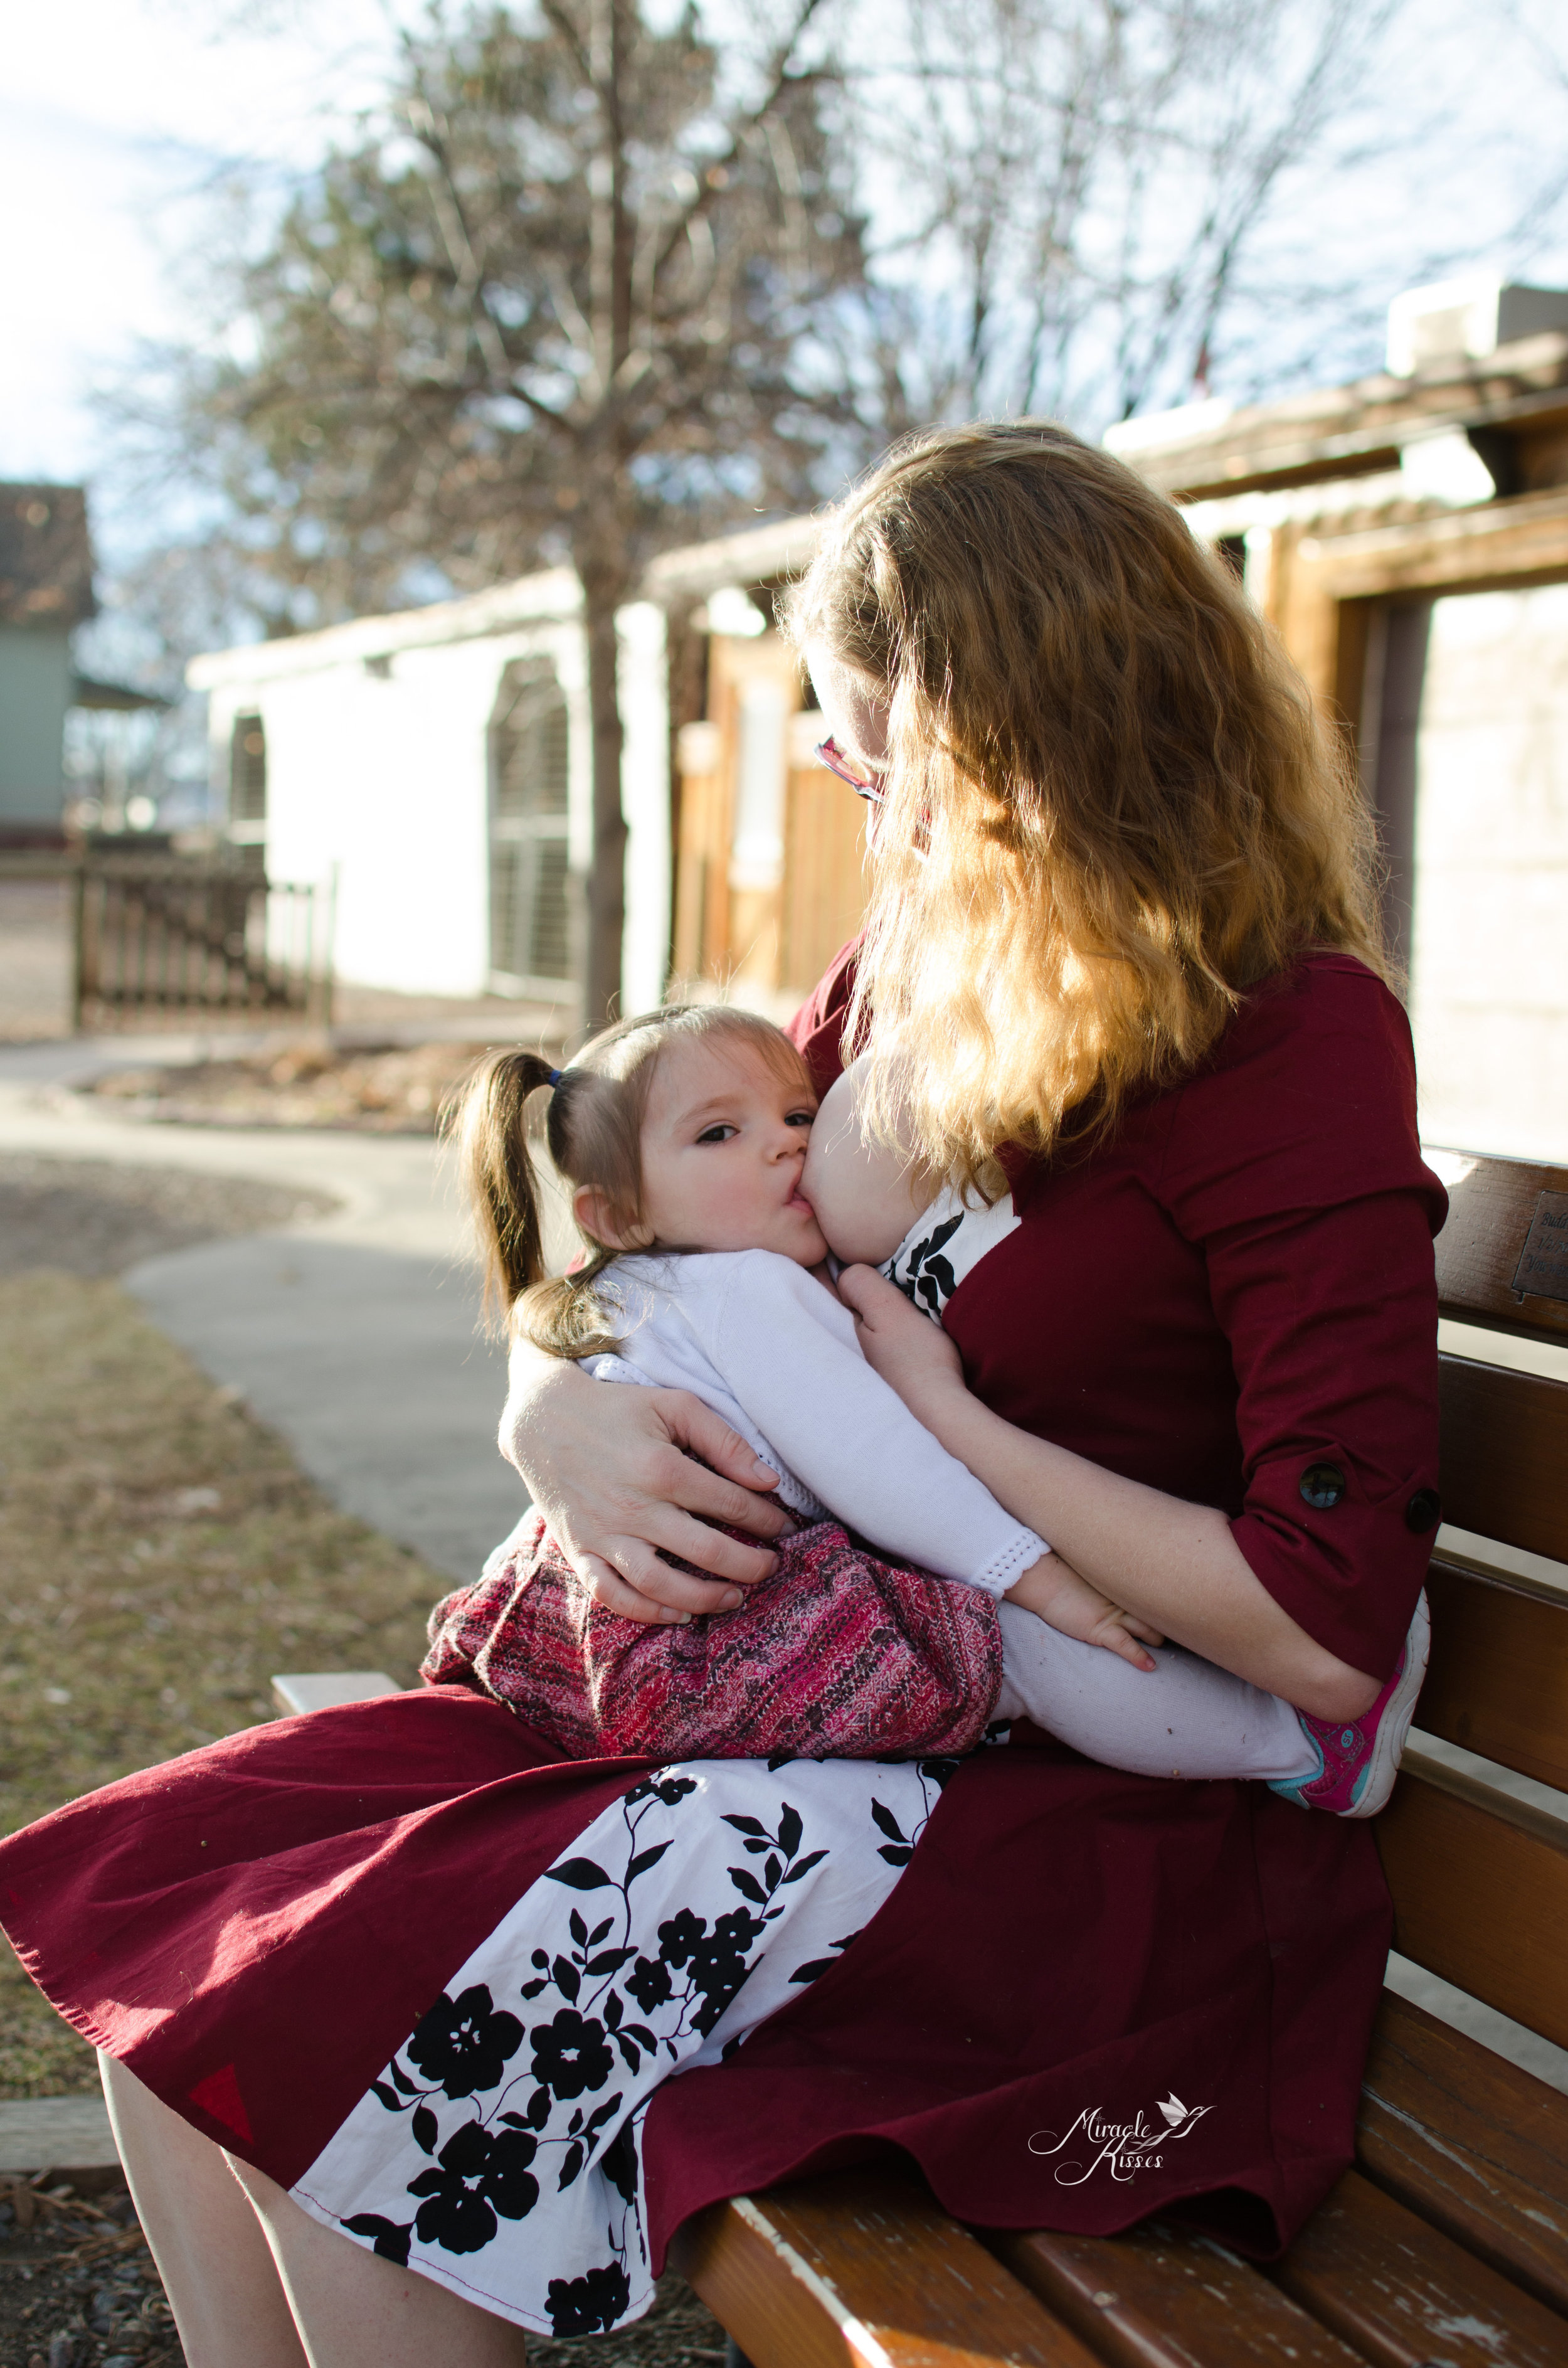 world breastfeeding week, normalize breastfeeding, sit up nursing